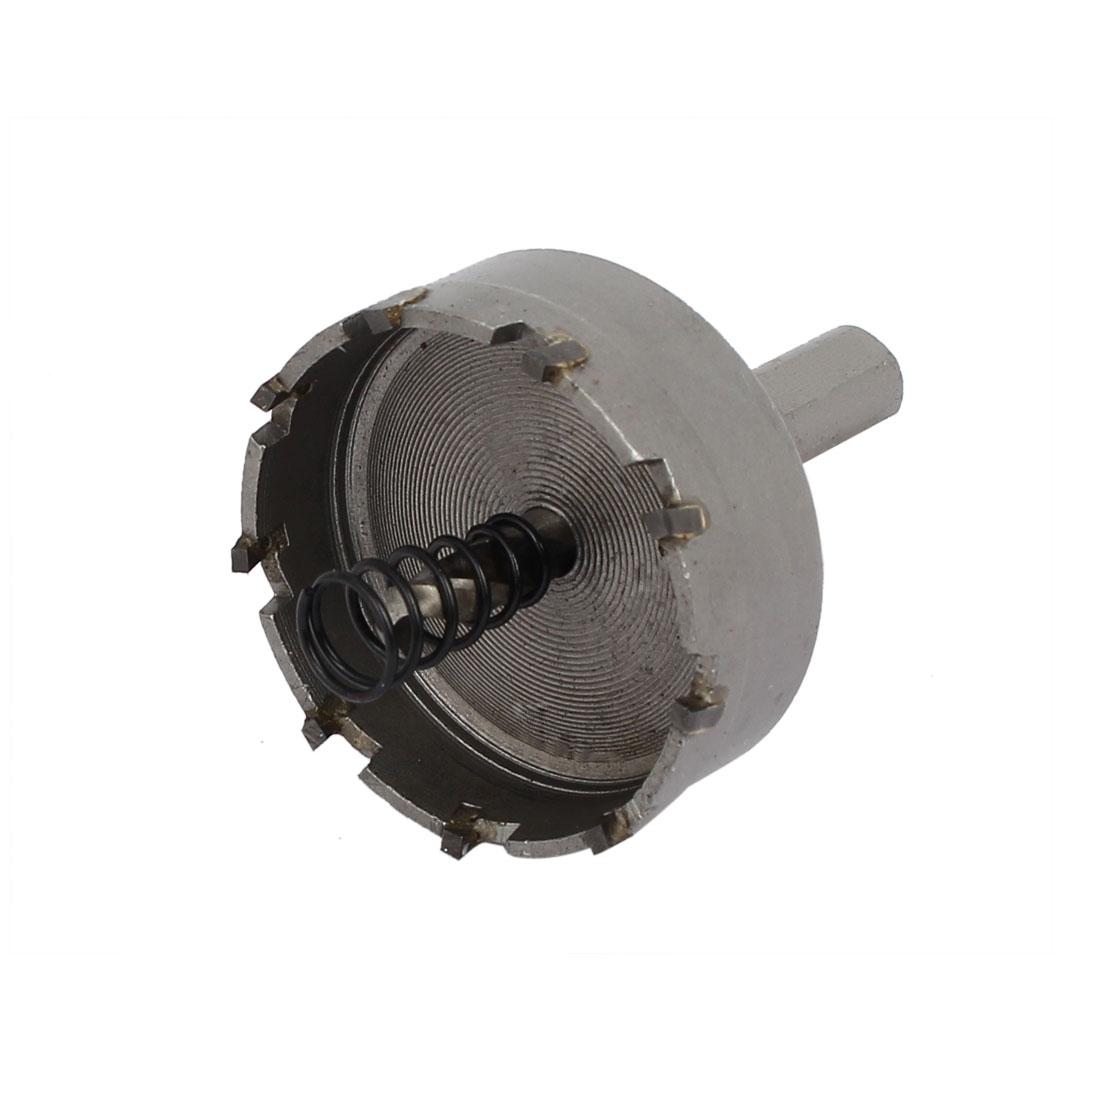 48mm Cutting Dia 6mm Twist Drilling Bit TCT Straight Shank Hole Saw Gray - image 3 de 3